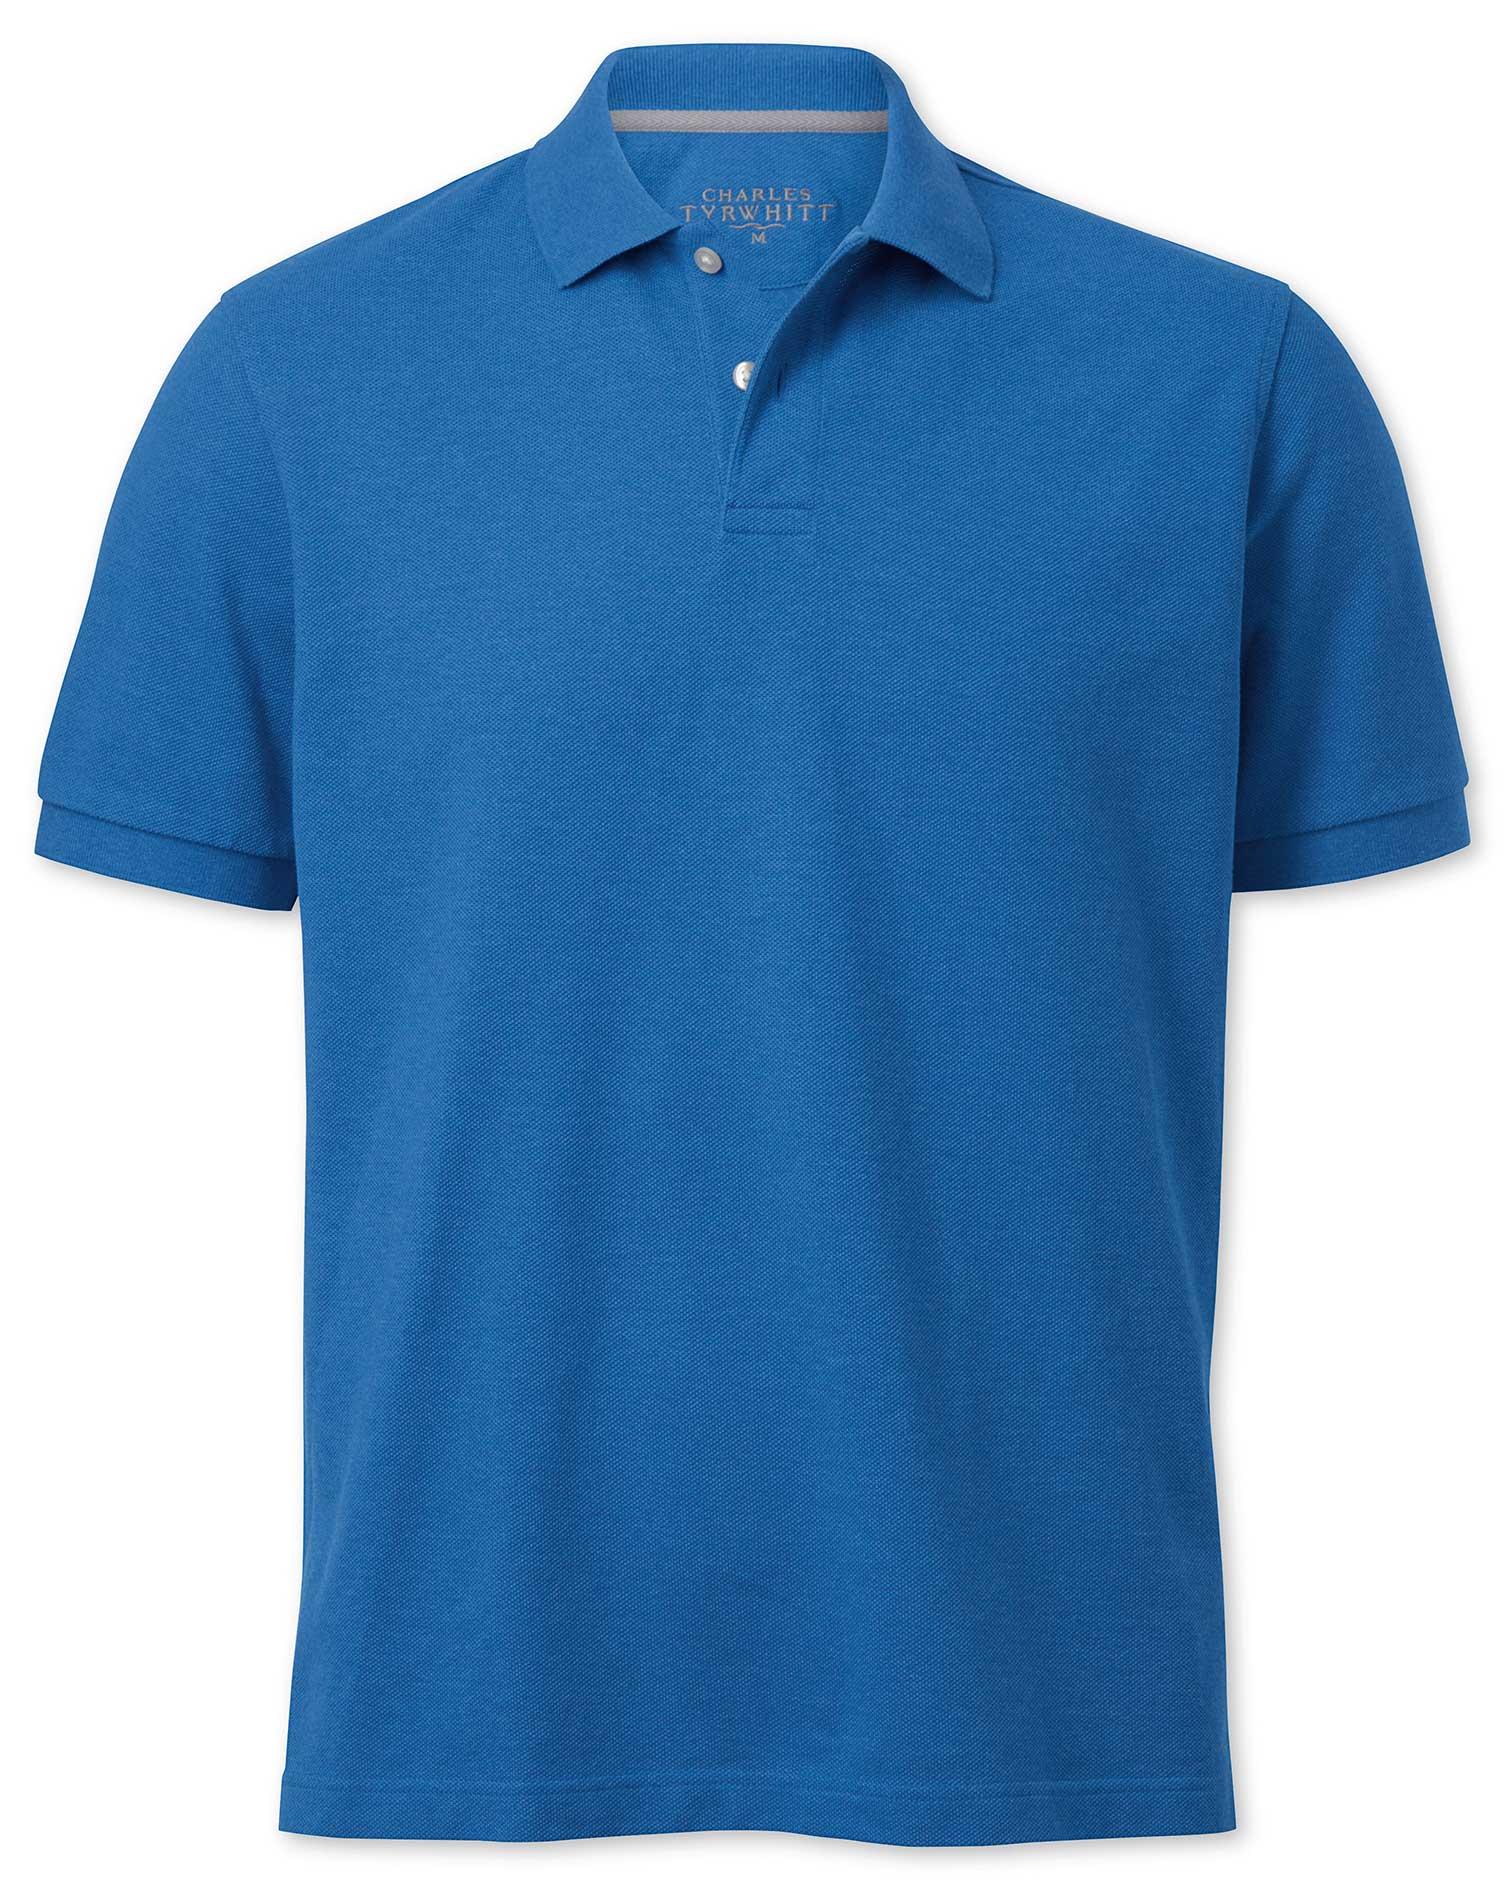 Blue Melange Pique Cotton Polo Size XXL by Charles Tyrwhitt